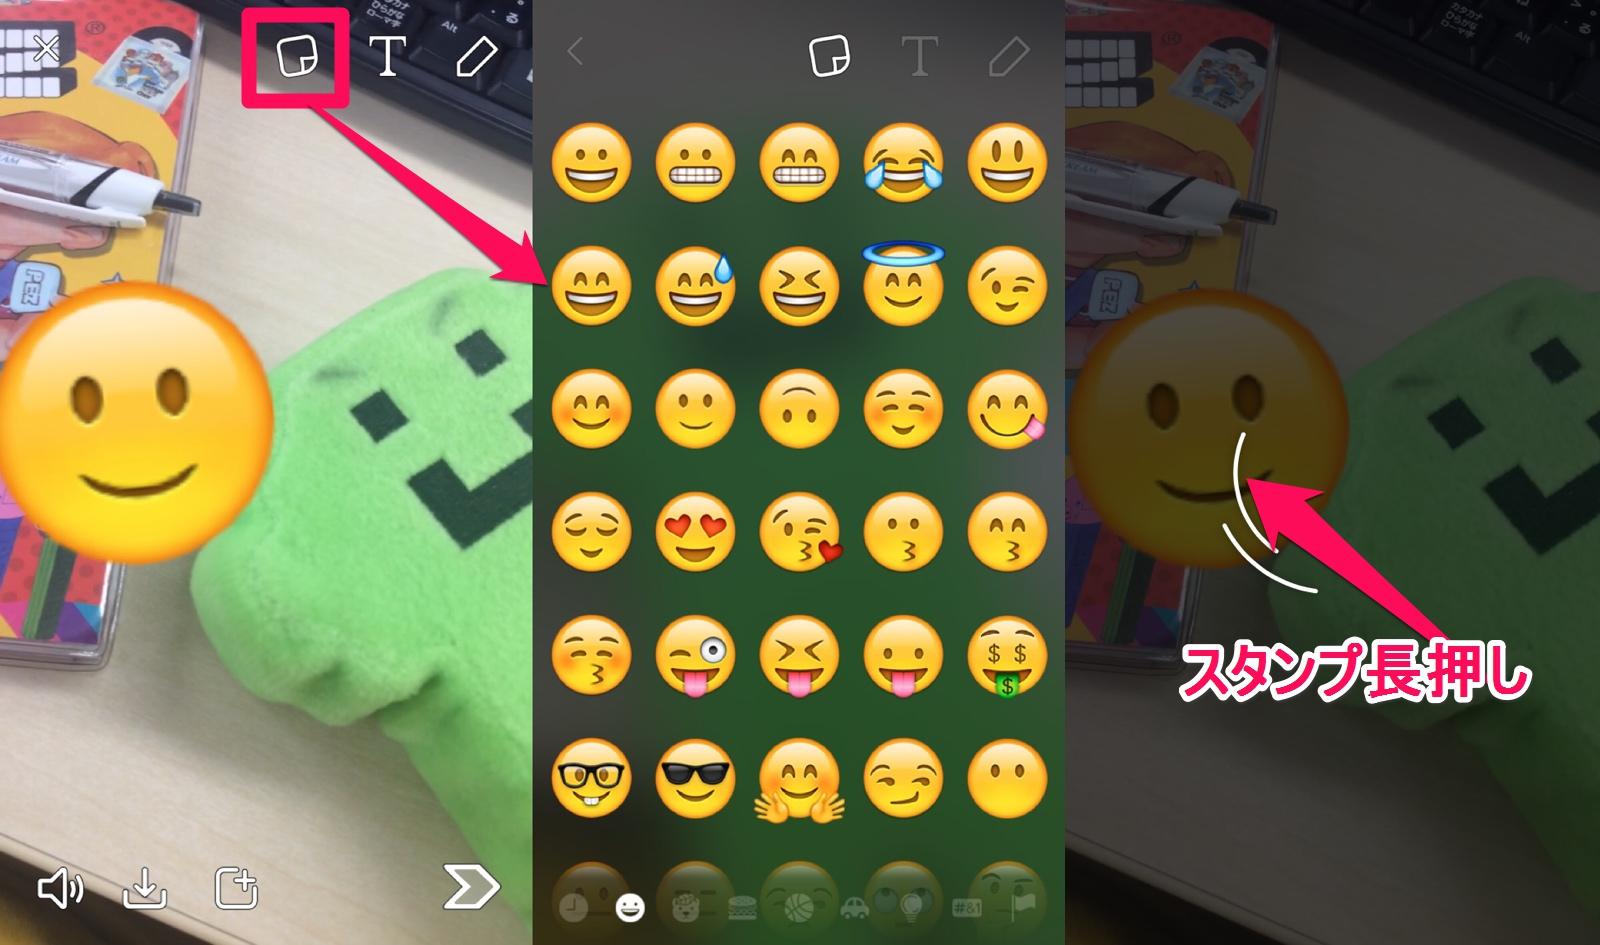 Snapchat3Dモーションスタンプ